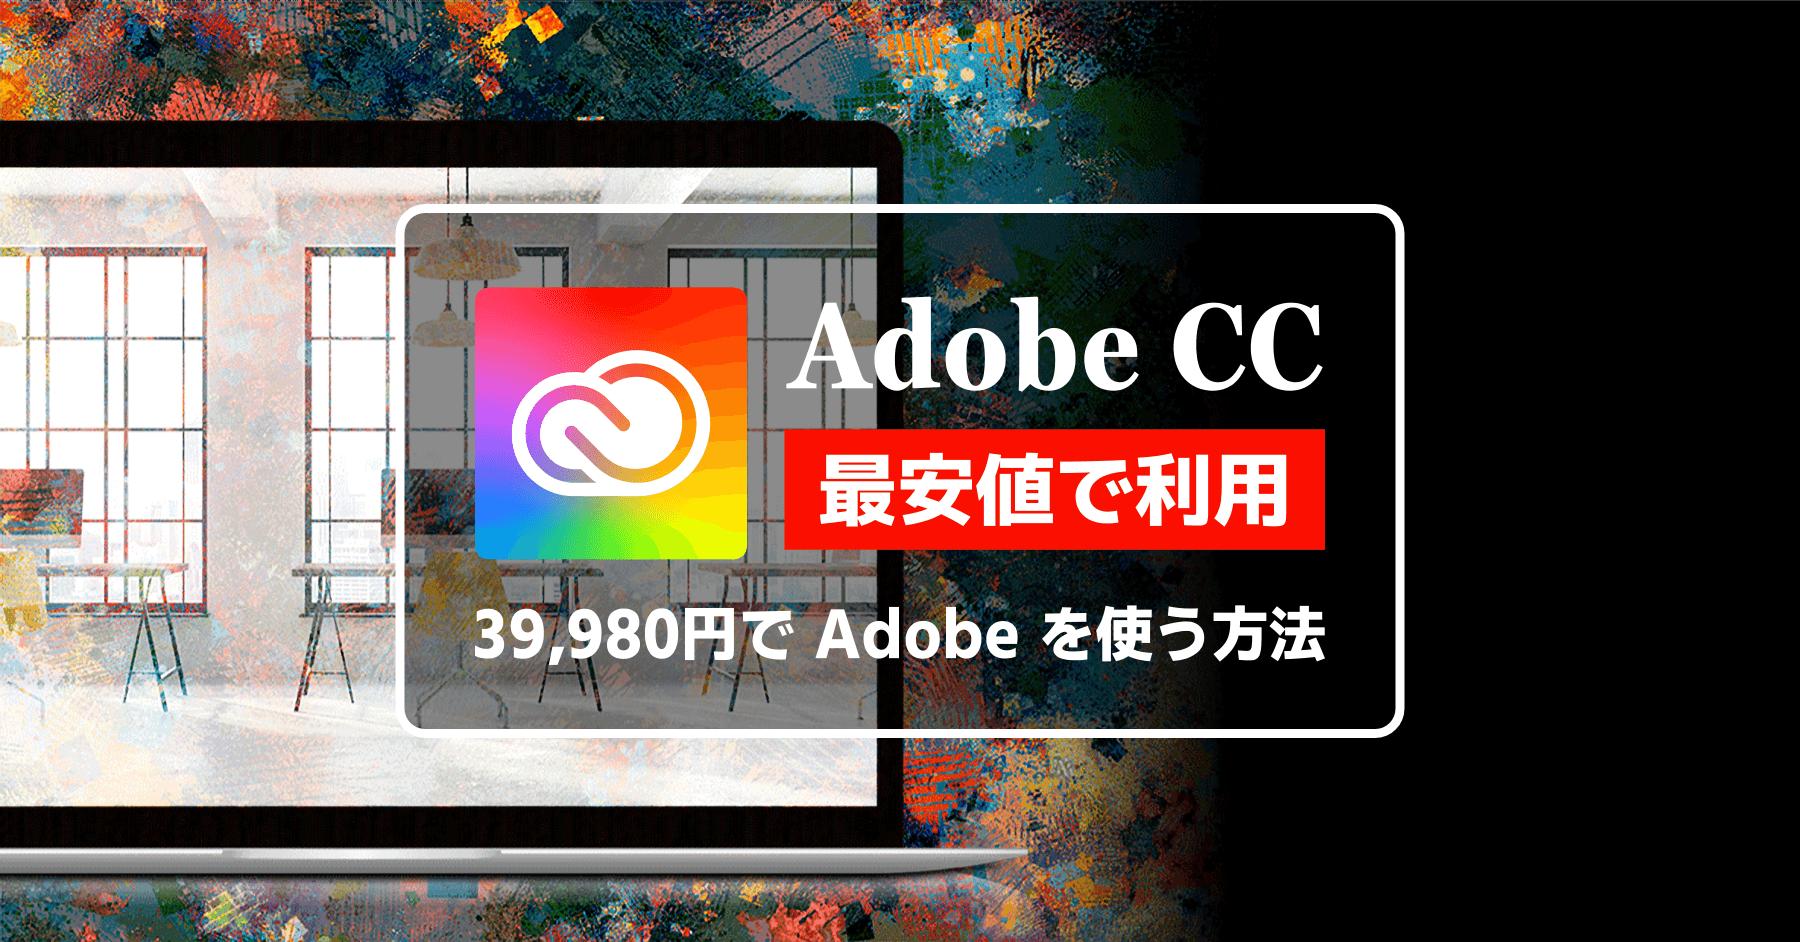 Adobe CC を最安値で更新する